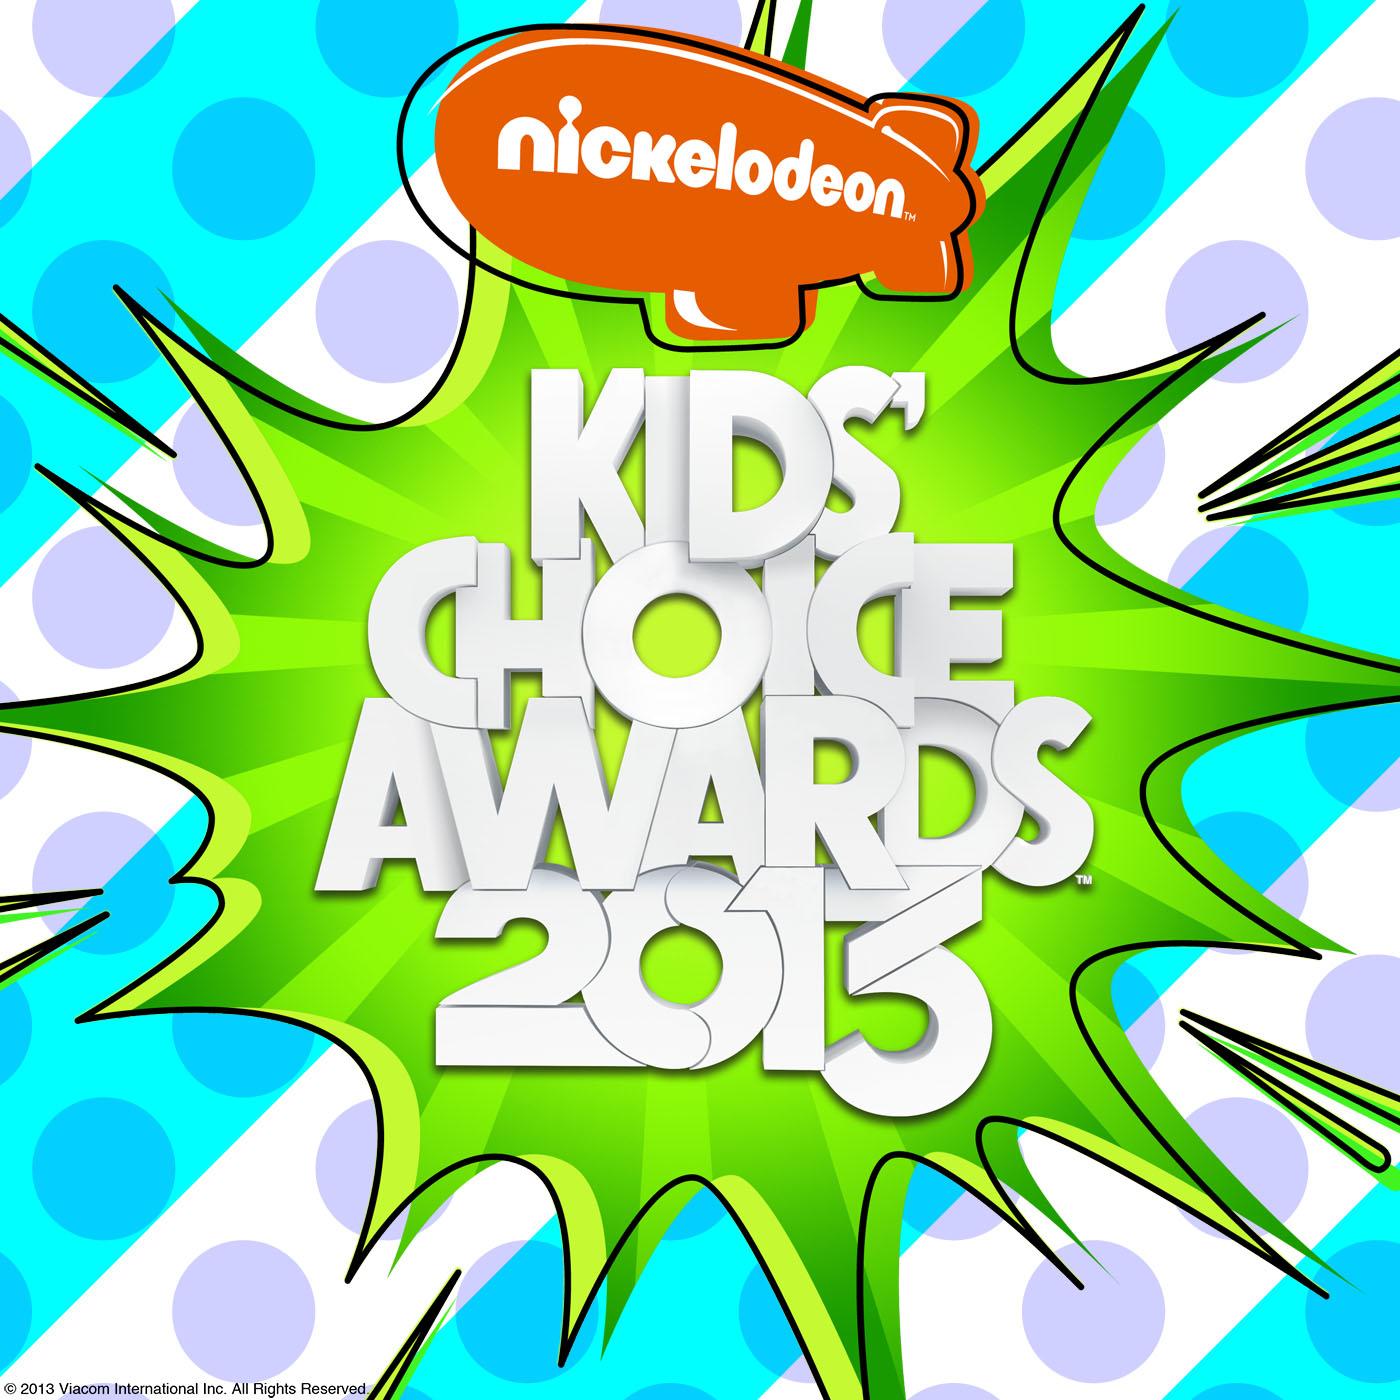 <![CDATA[Nickelodeon Kids' Choice Awards 2013]]>